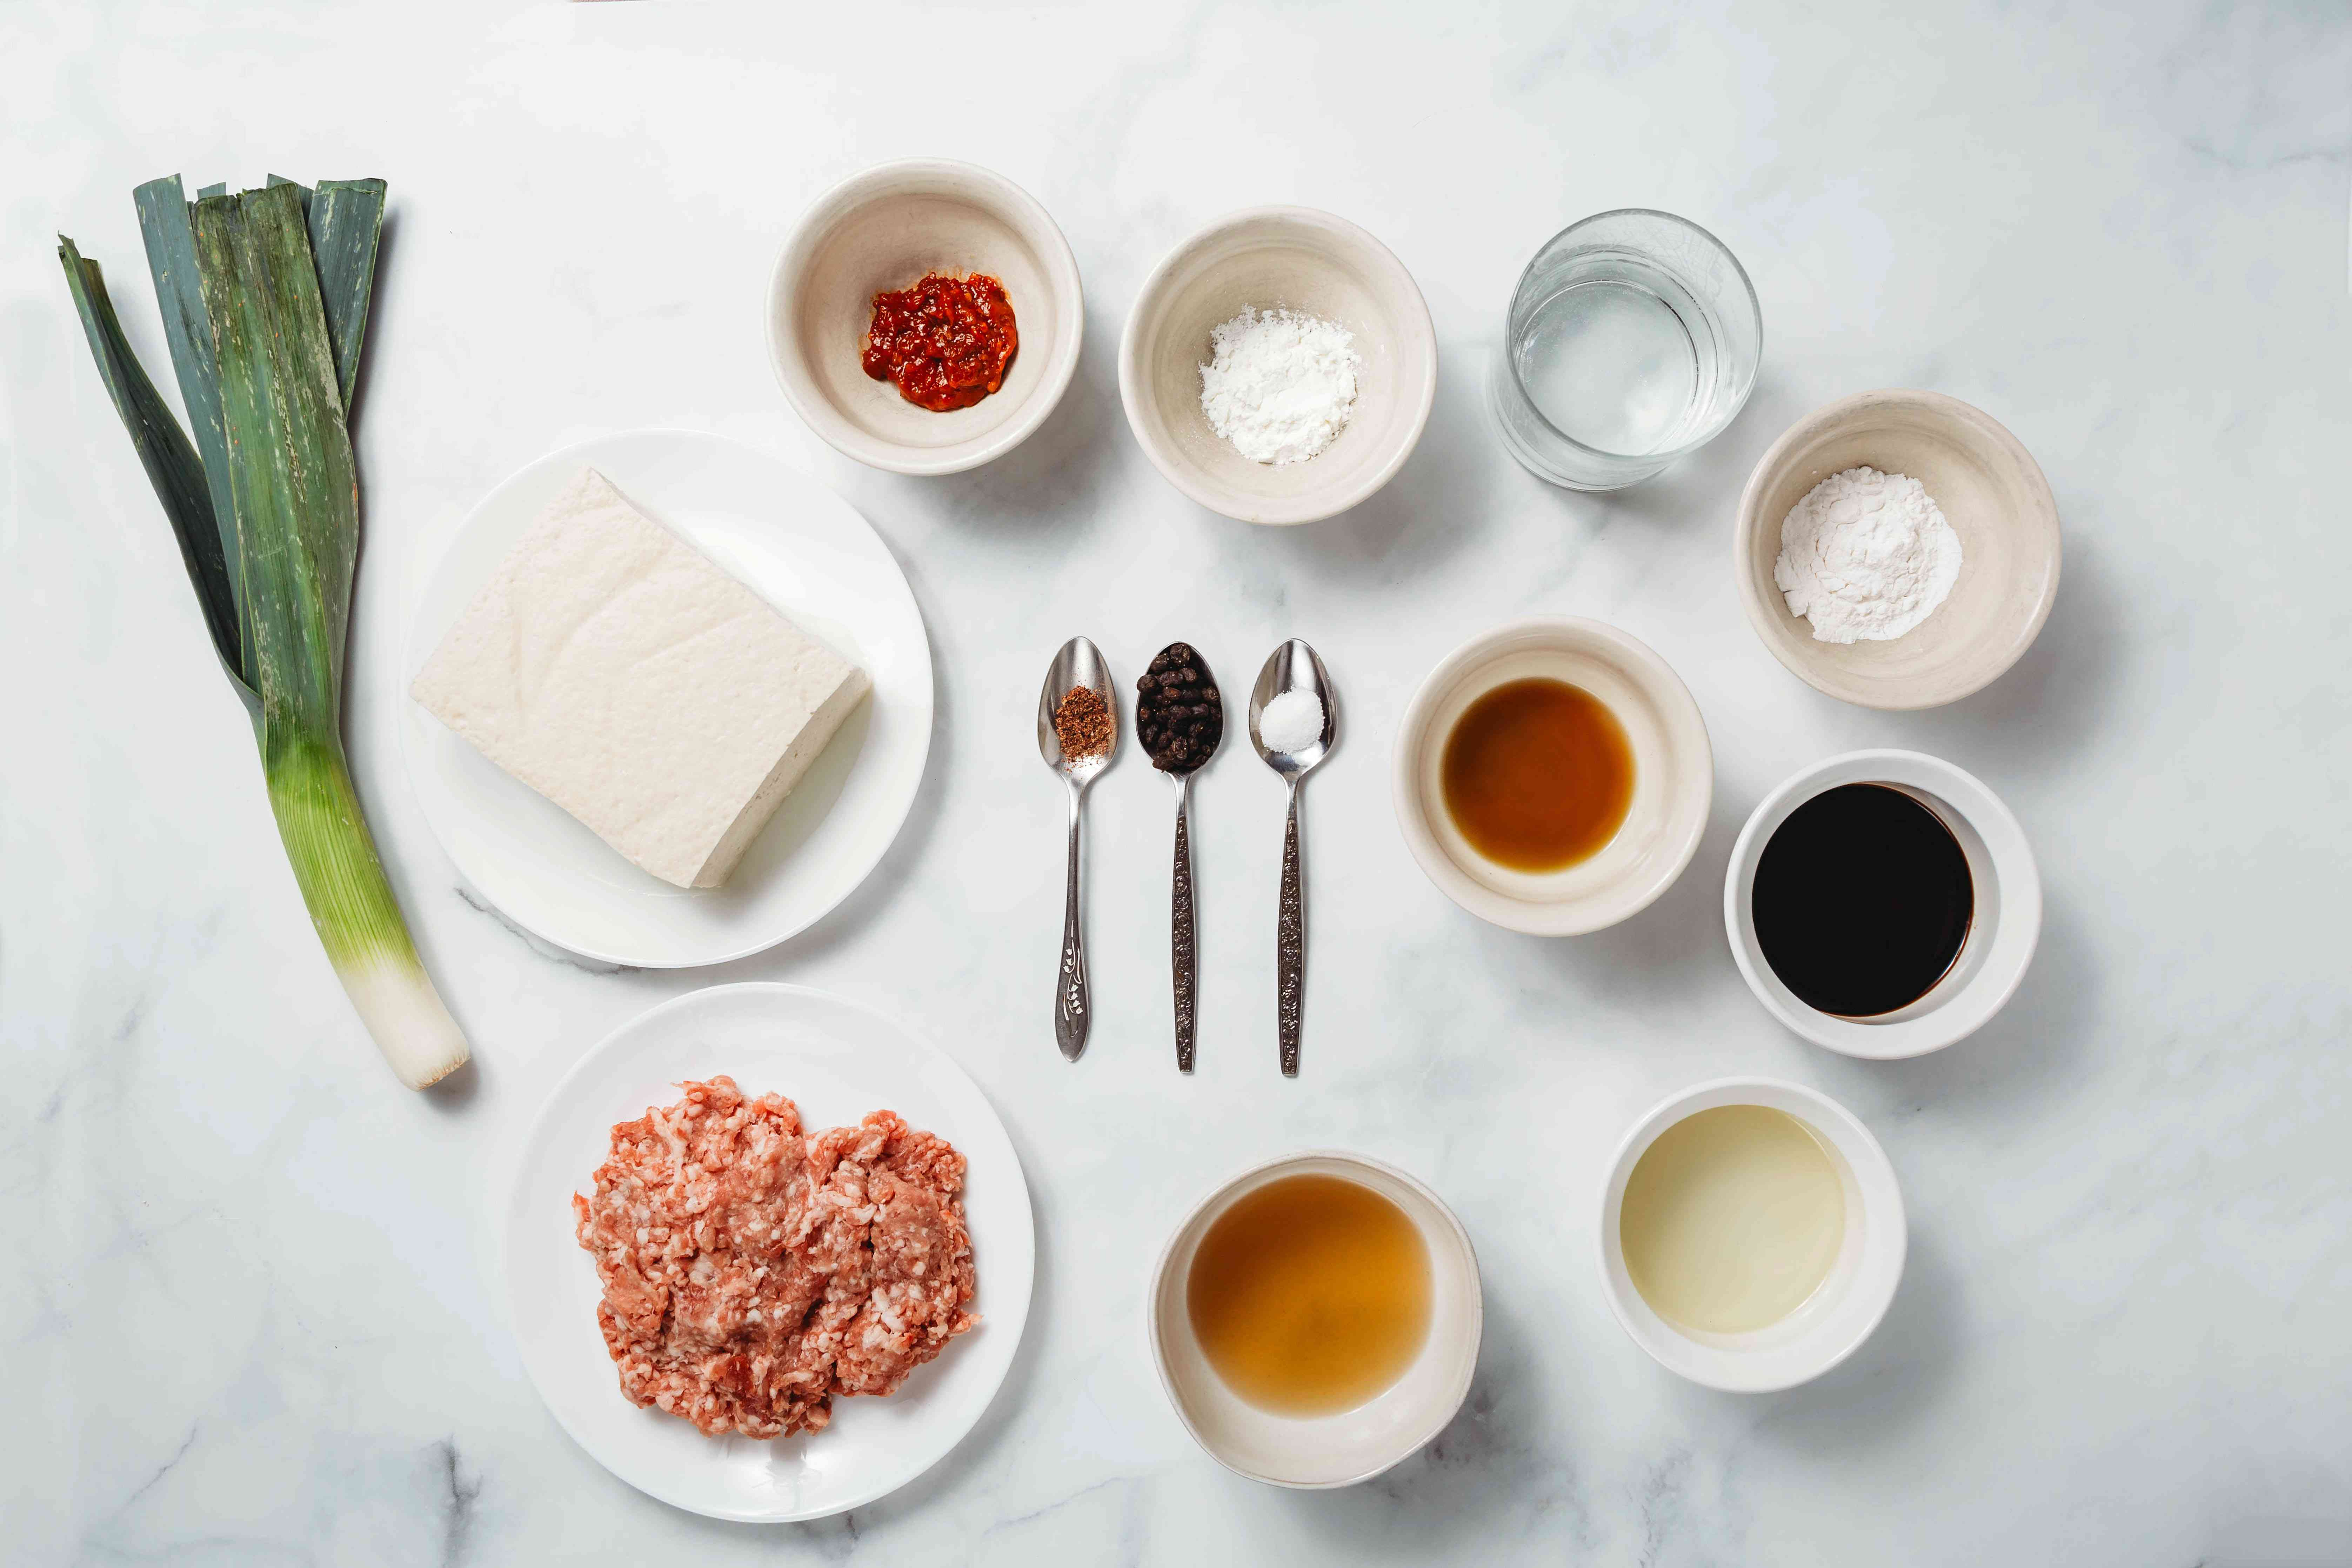 Mapo tofu recipe ingredients